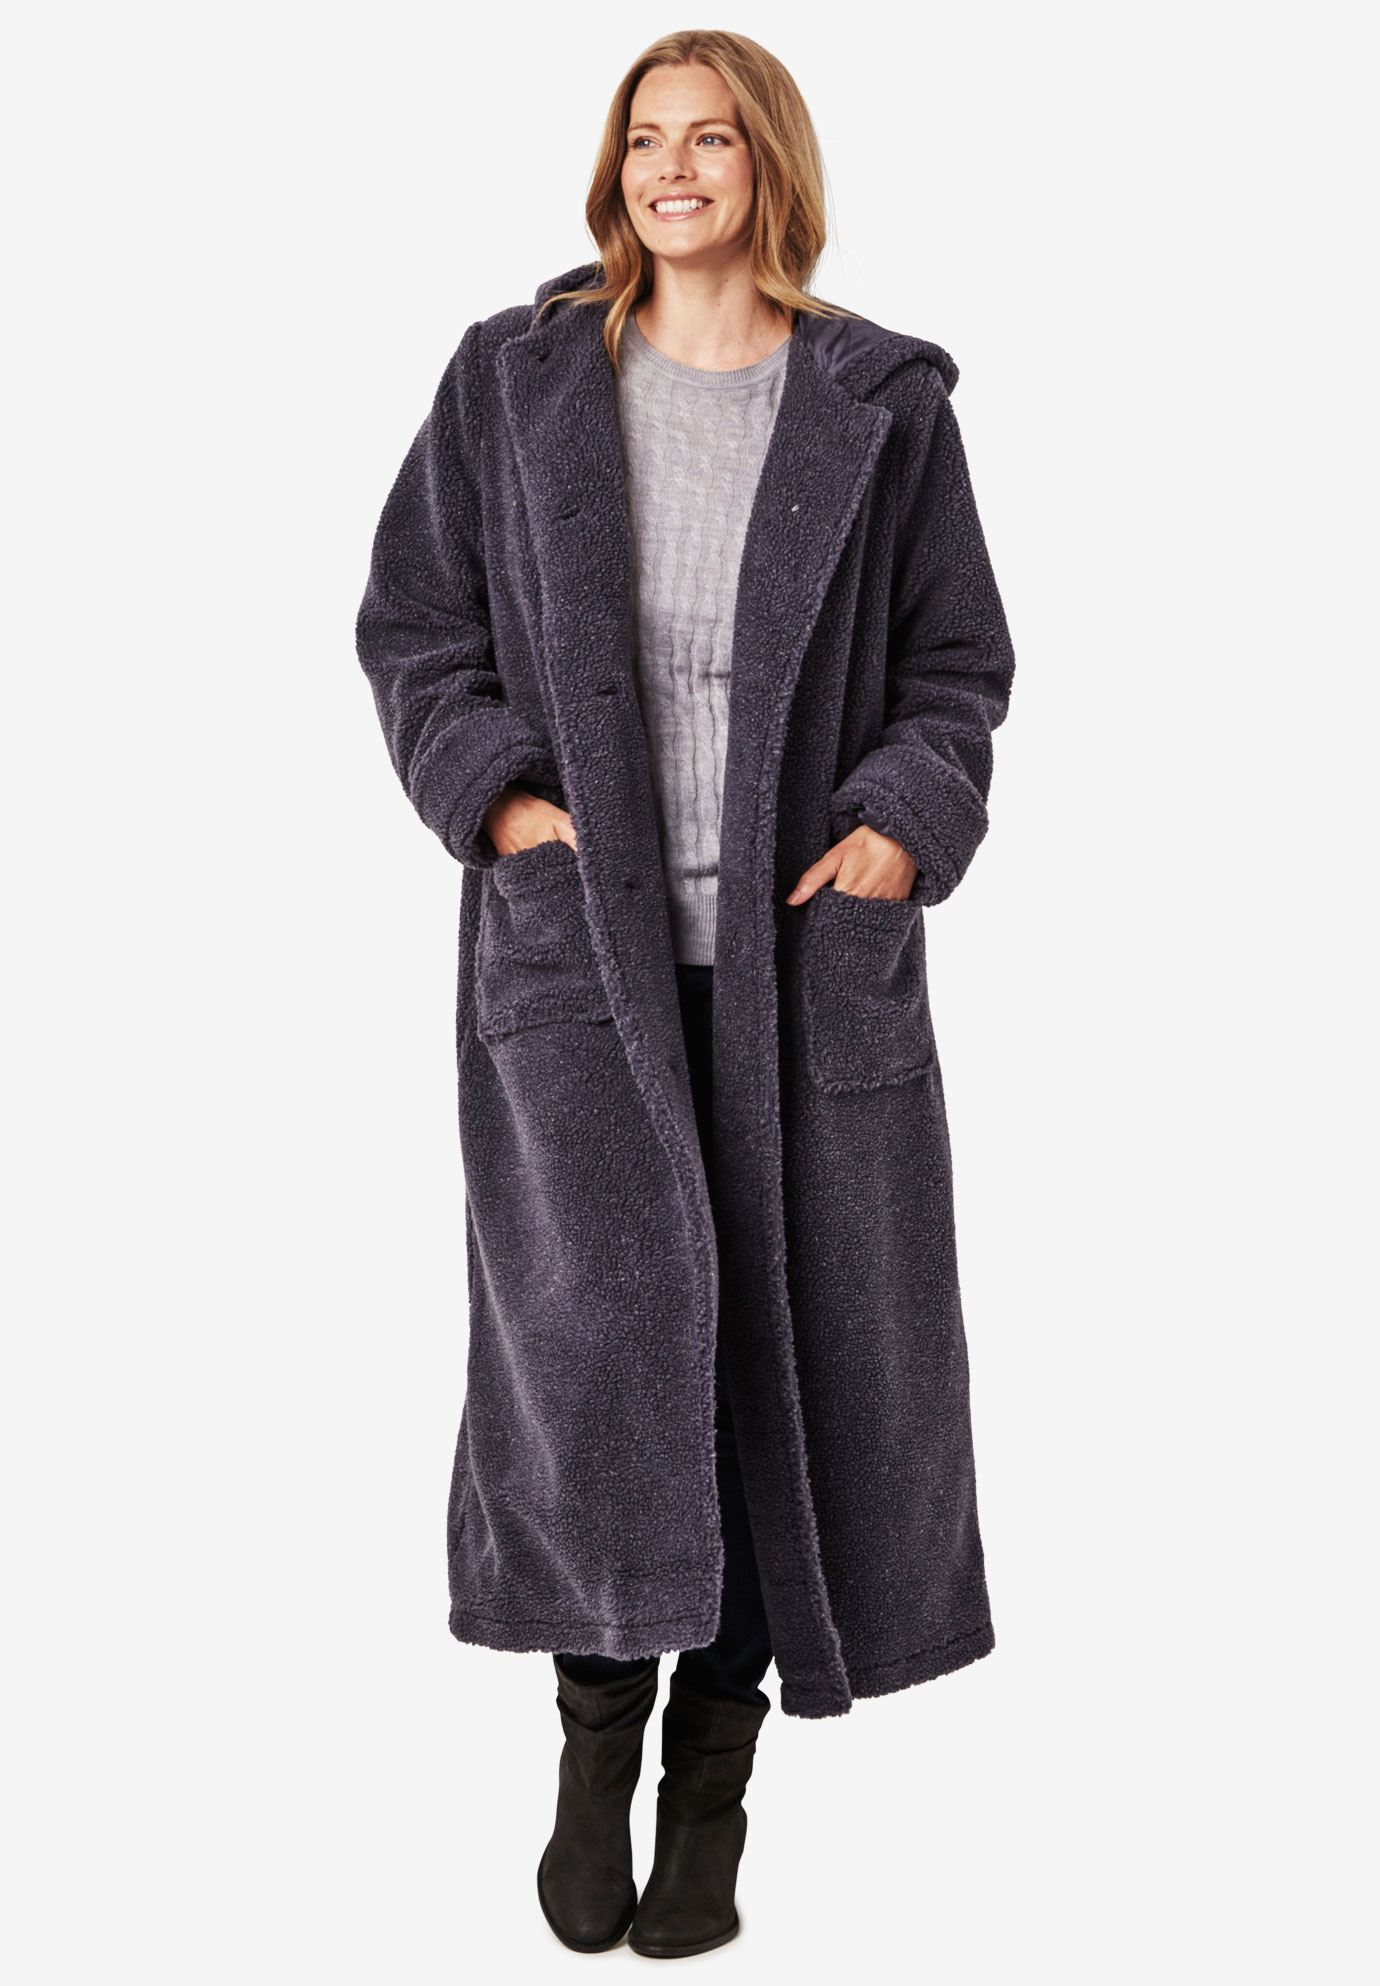 3220b7a22c7 Hooded Berber Fleece Duster Coat